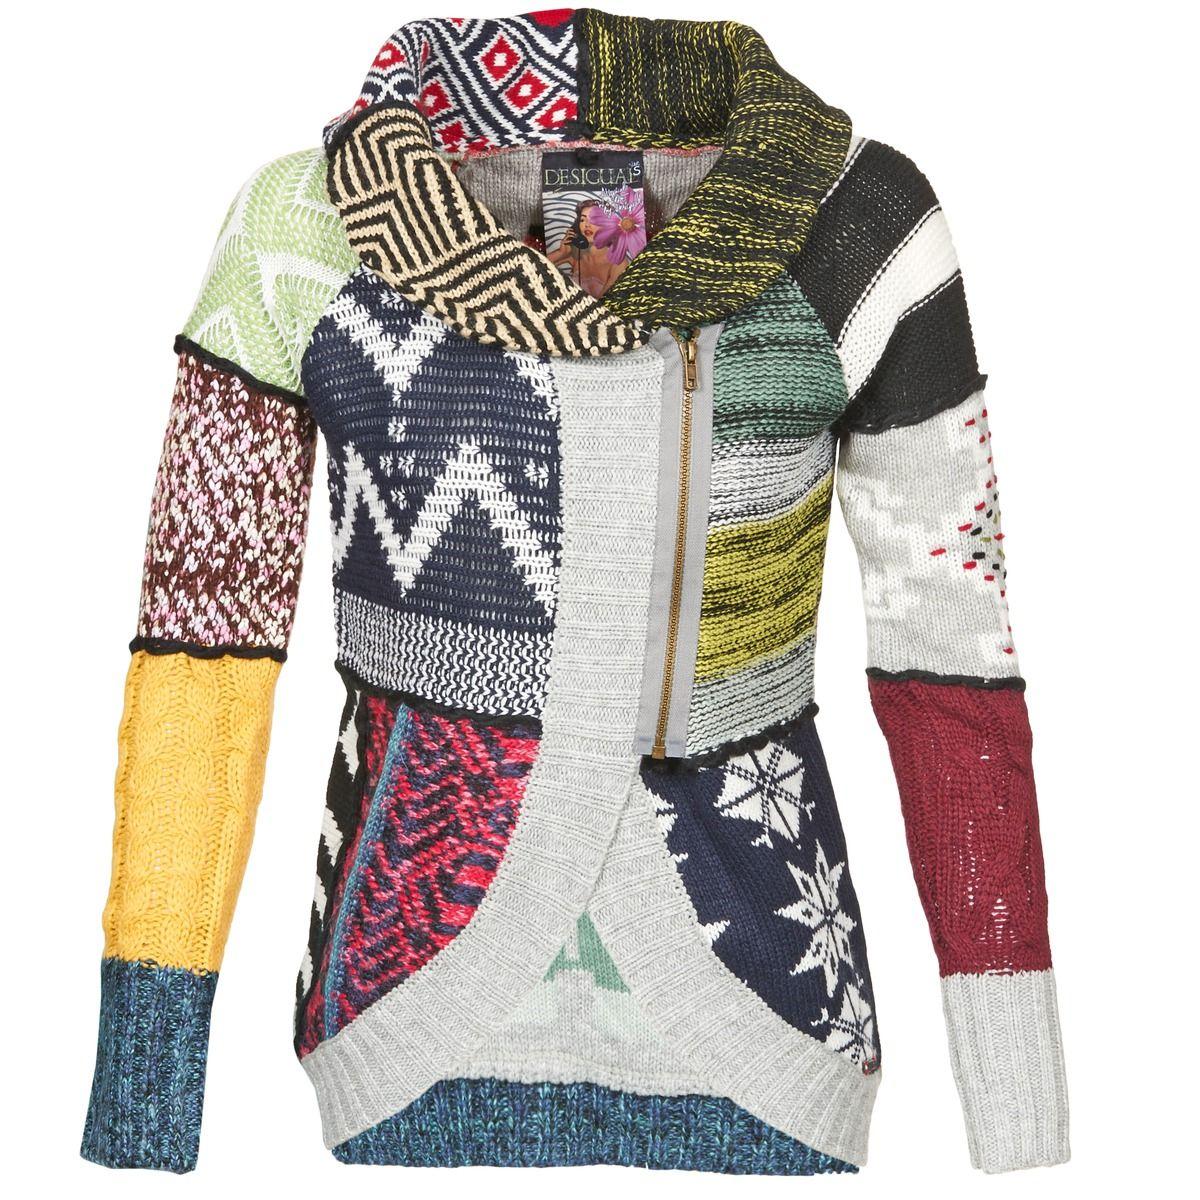 Veste laine femme multicolore